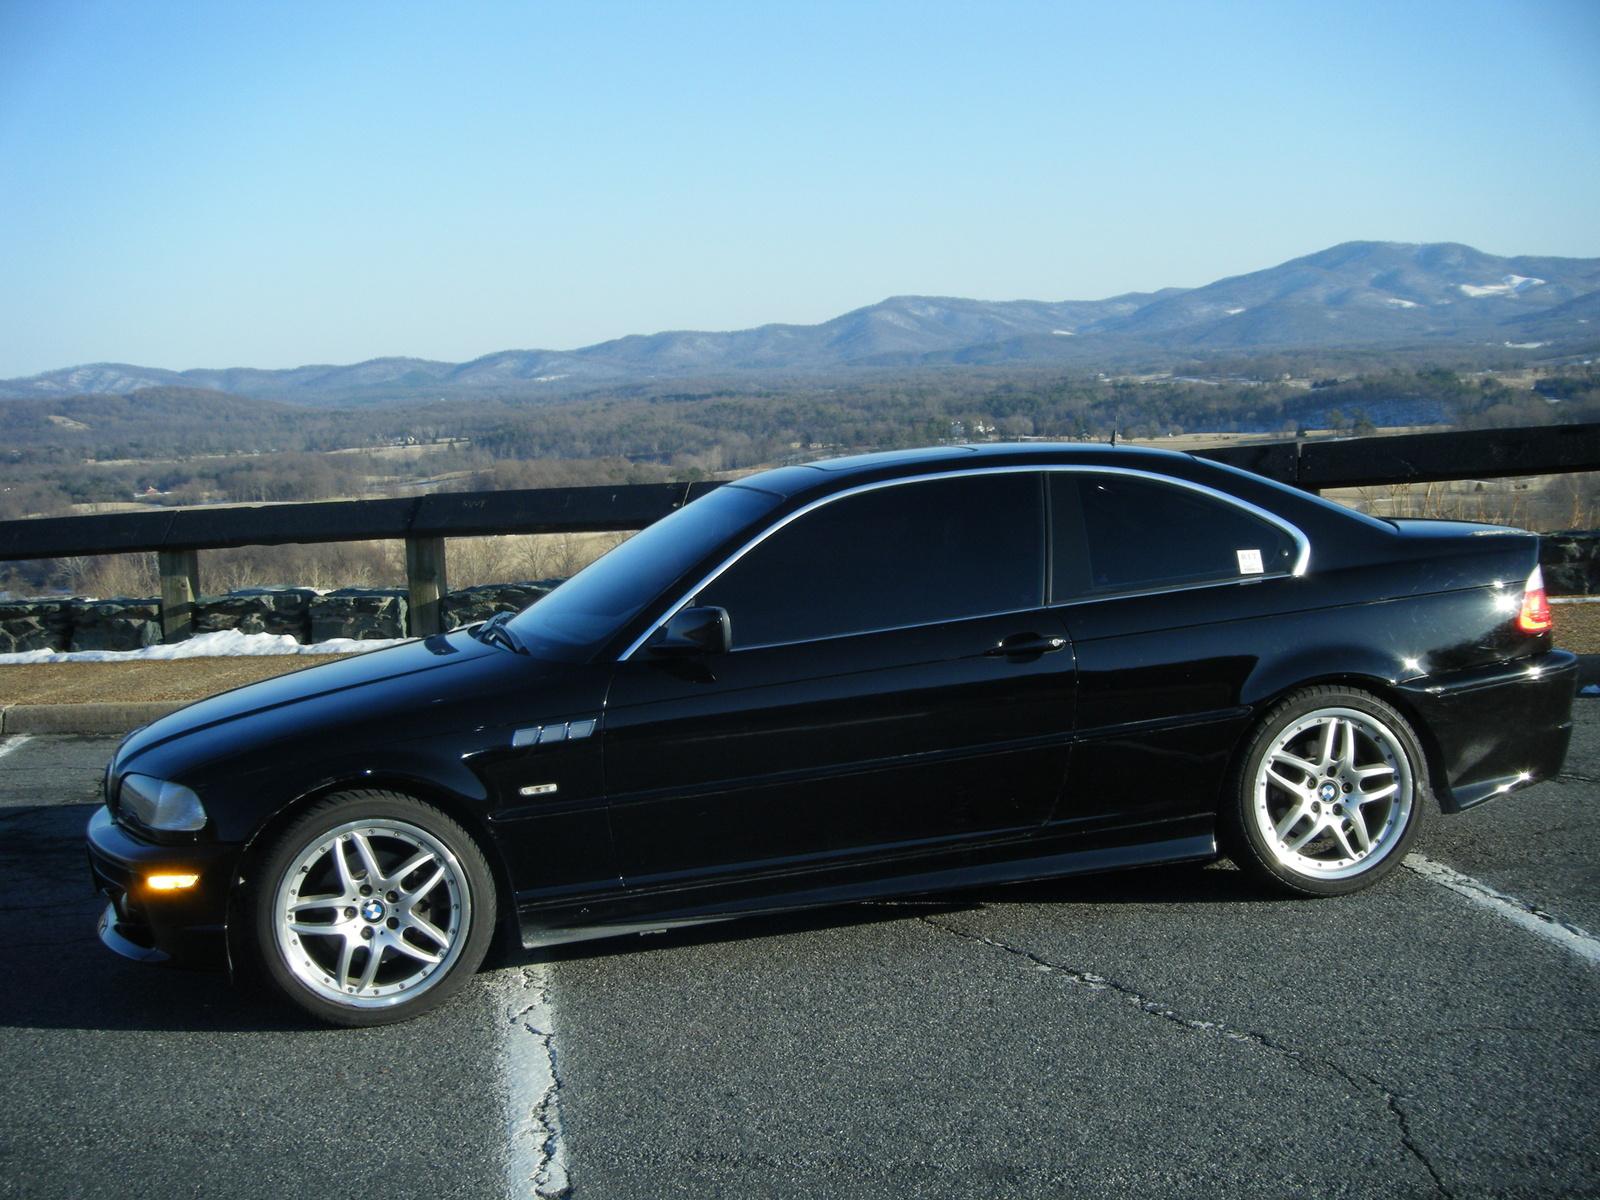 BMW™ 316ti Compact {E46} (2000) - Pictures im spiel märkte williamhill